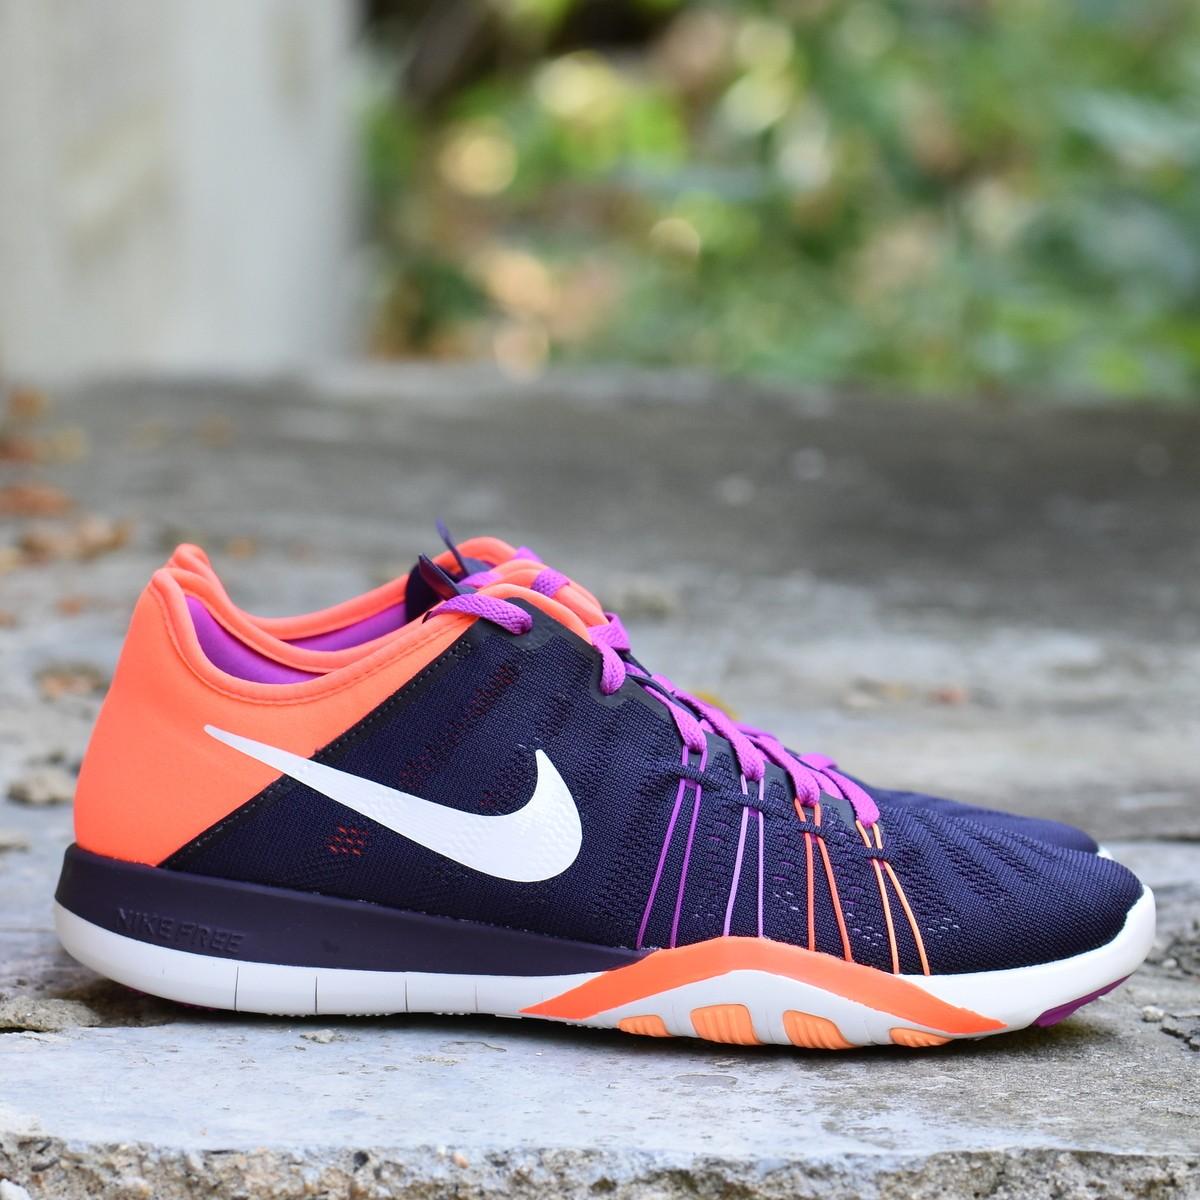 1acdca3a3708b Nike WMNS FREE TR 6 Dámské boty 833413-500 - Glami.cz